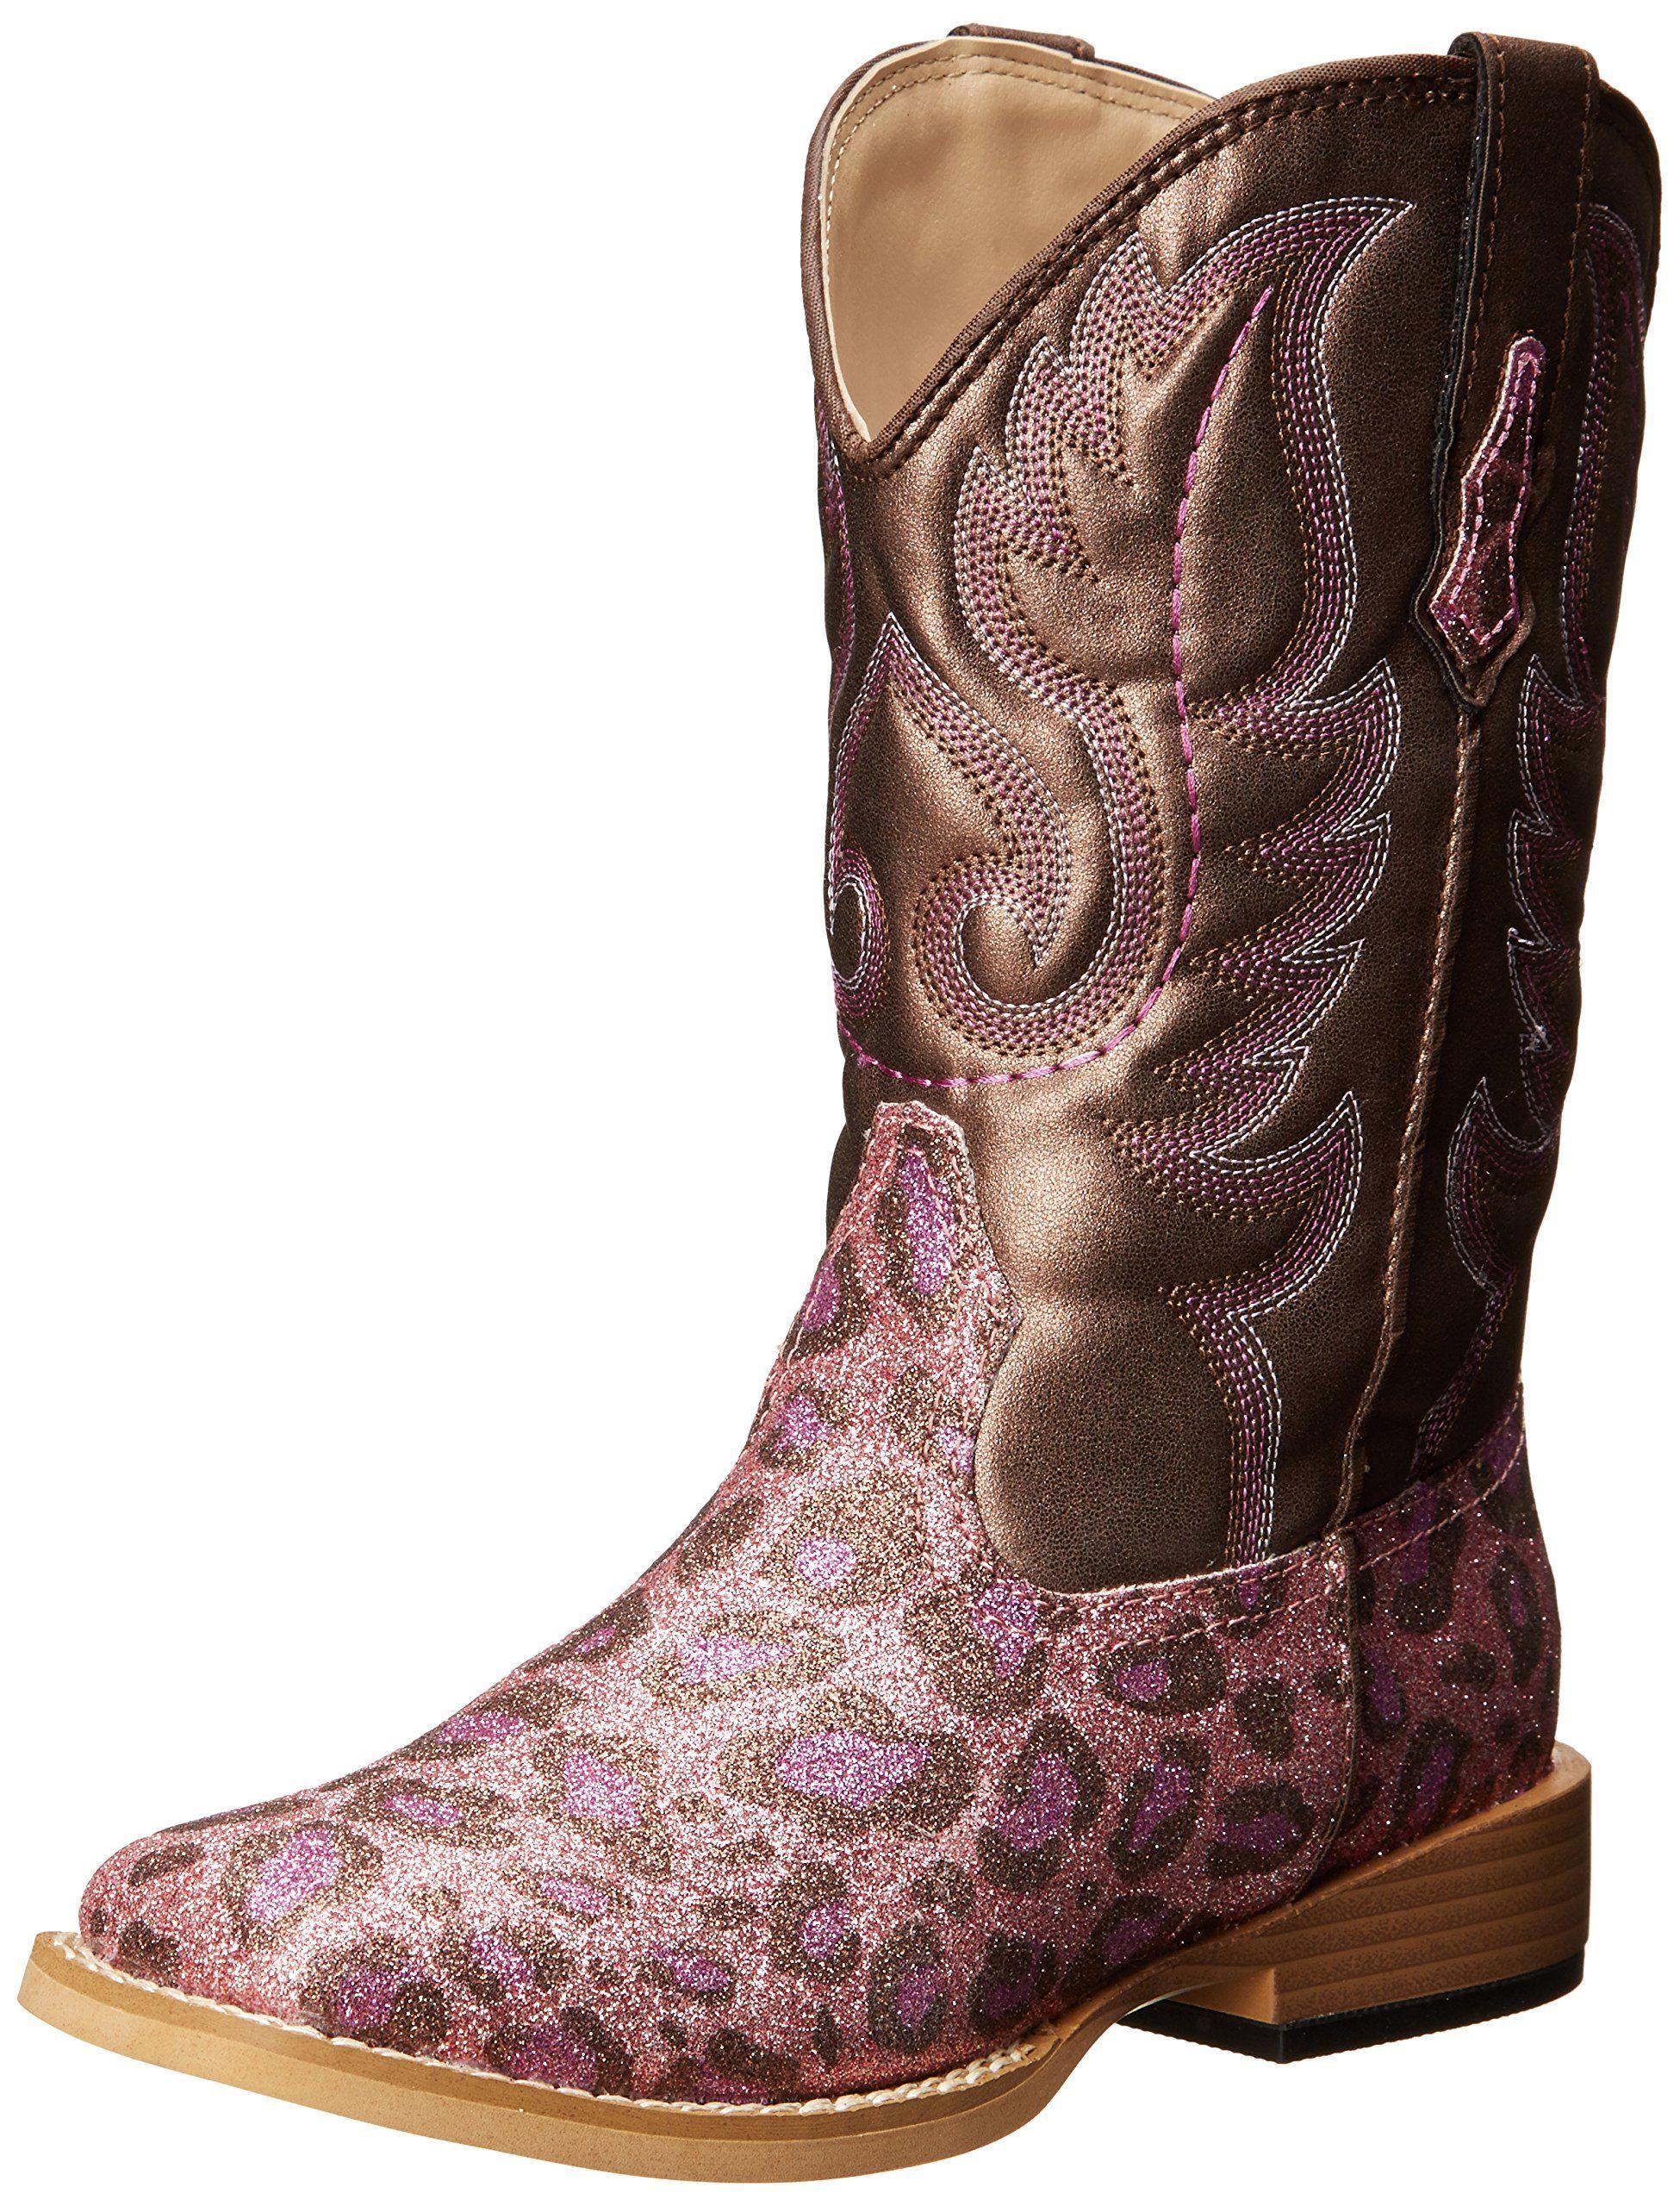 886468e7b49 Flower girl boots    Roper Square Toe Glitter Leopard Western Boot ...